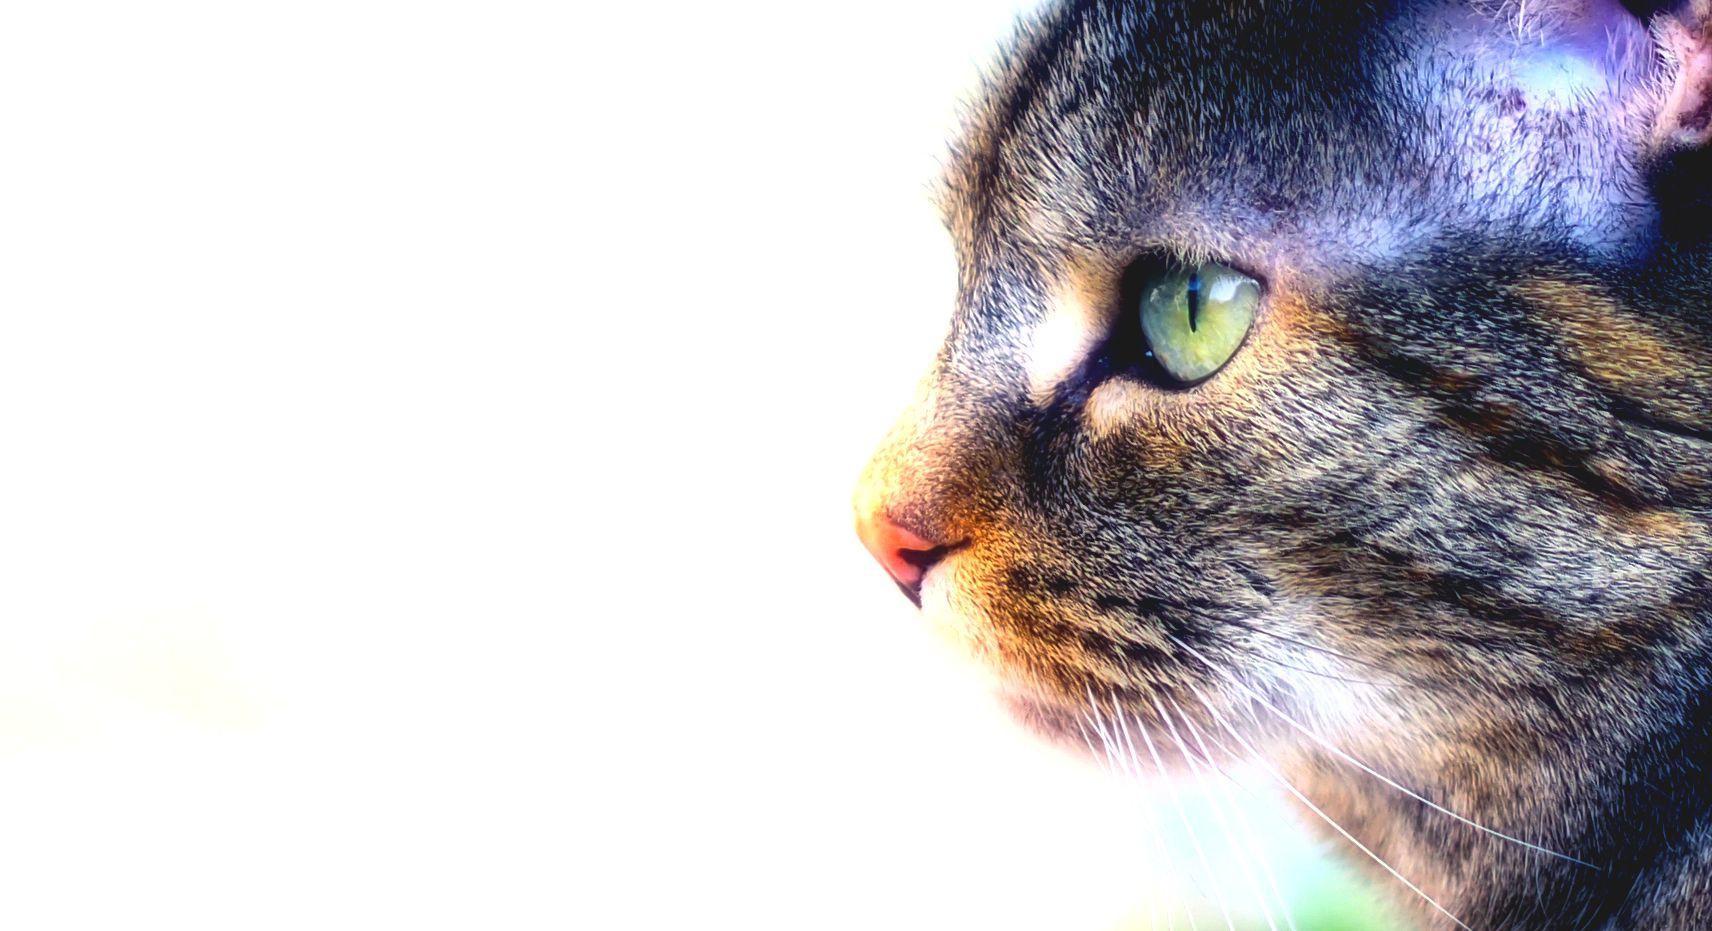 The eye of the tiger .... hömm